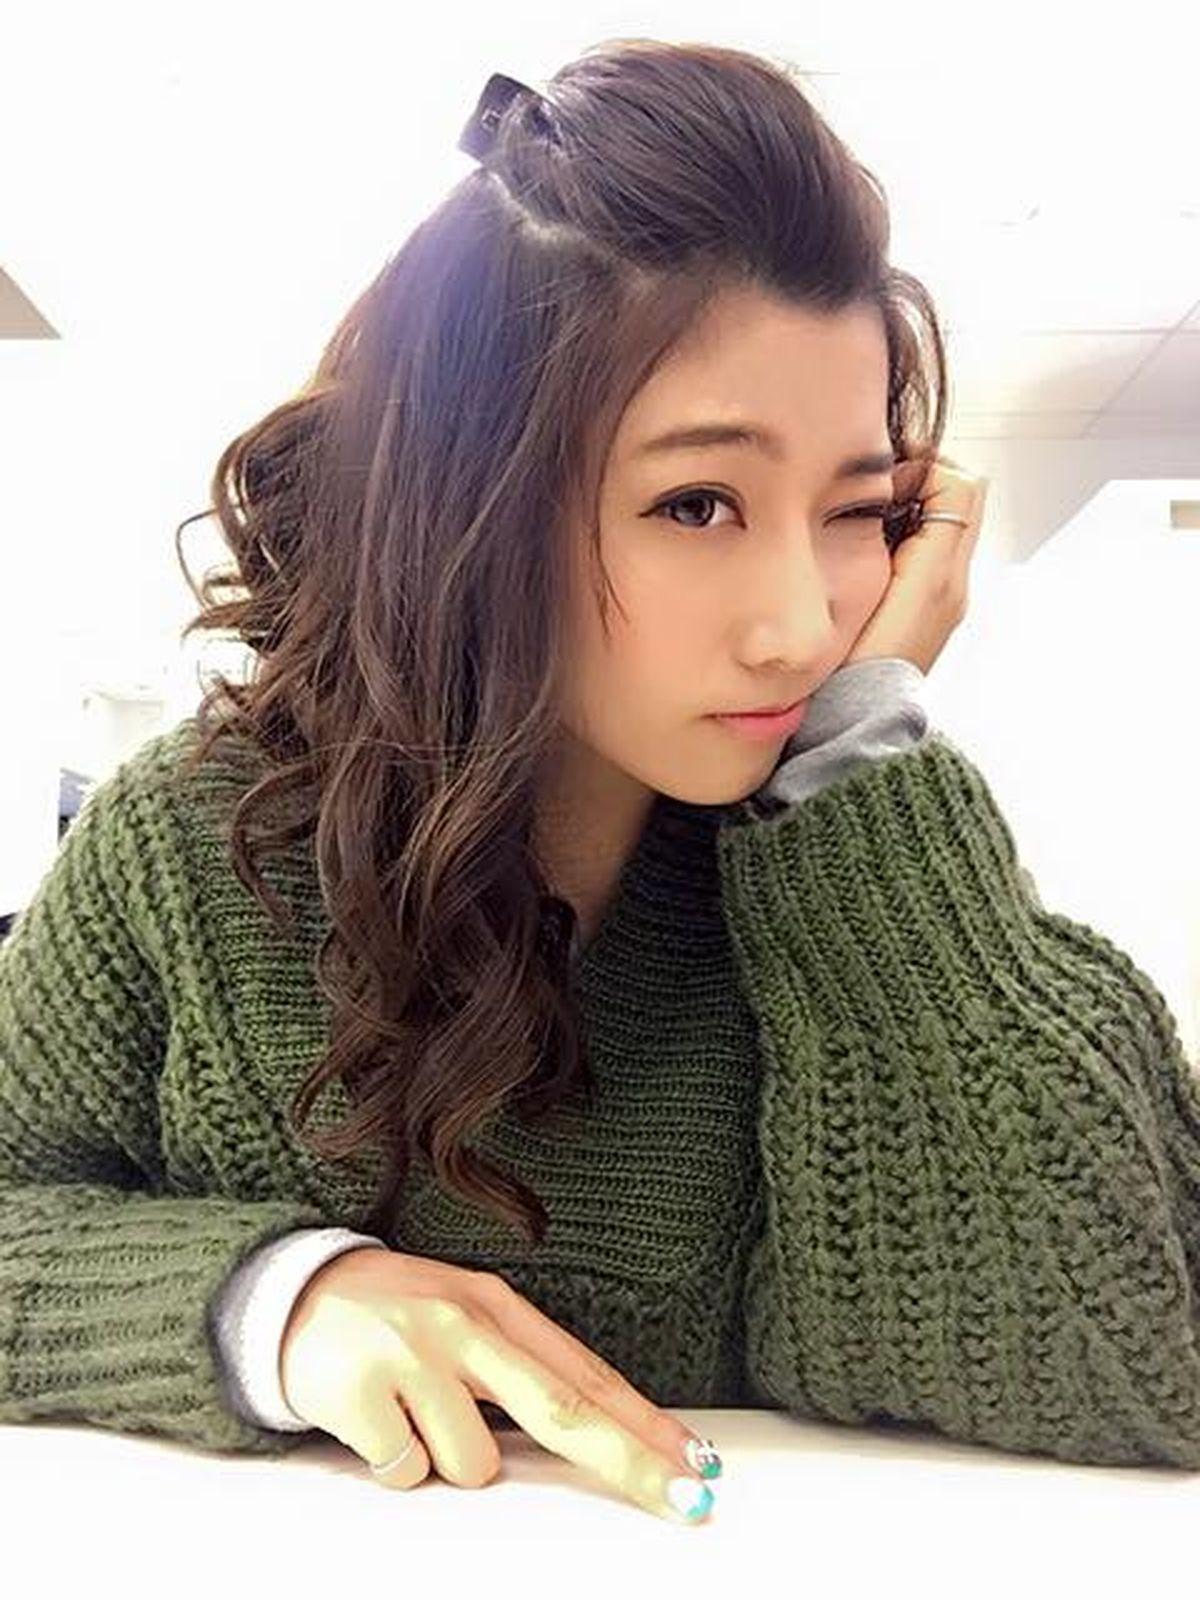 香澄 instagram 森